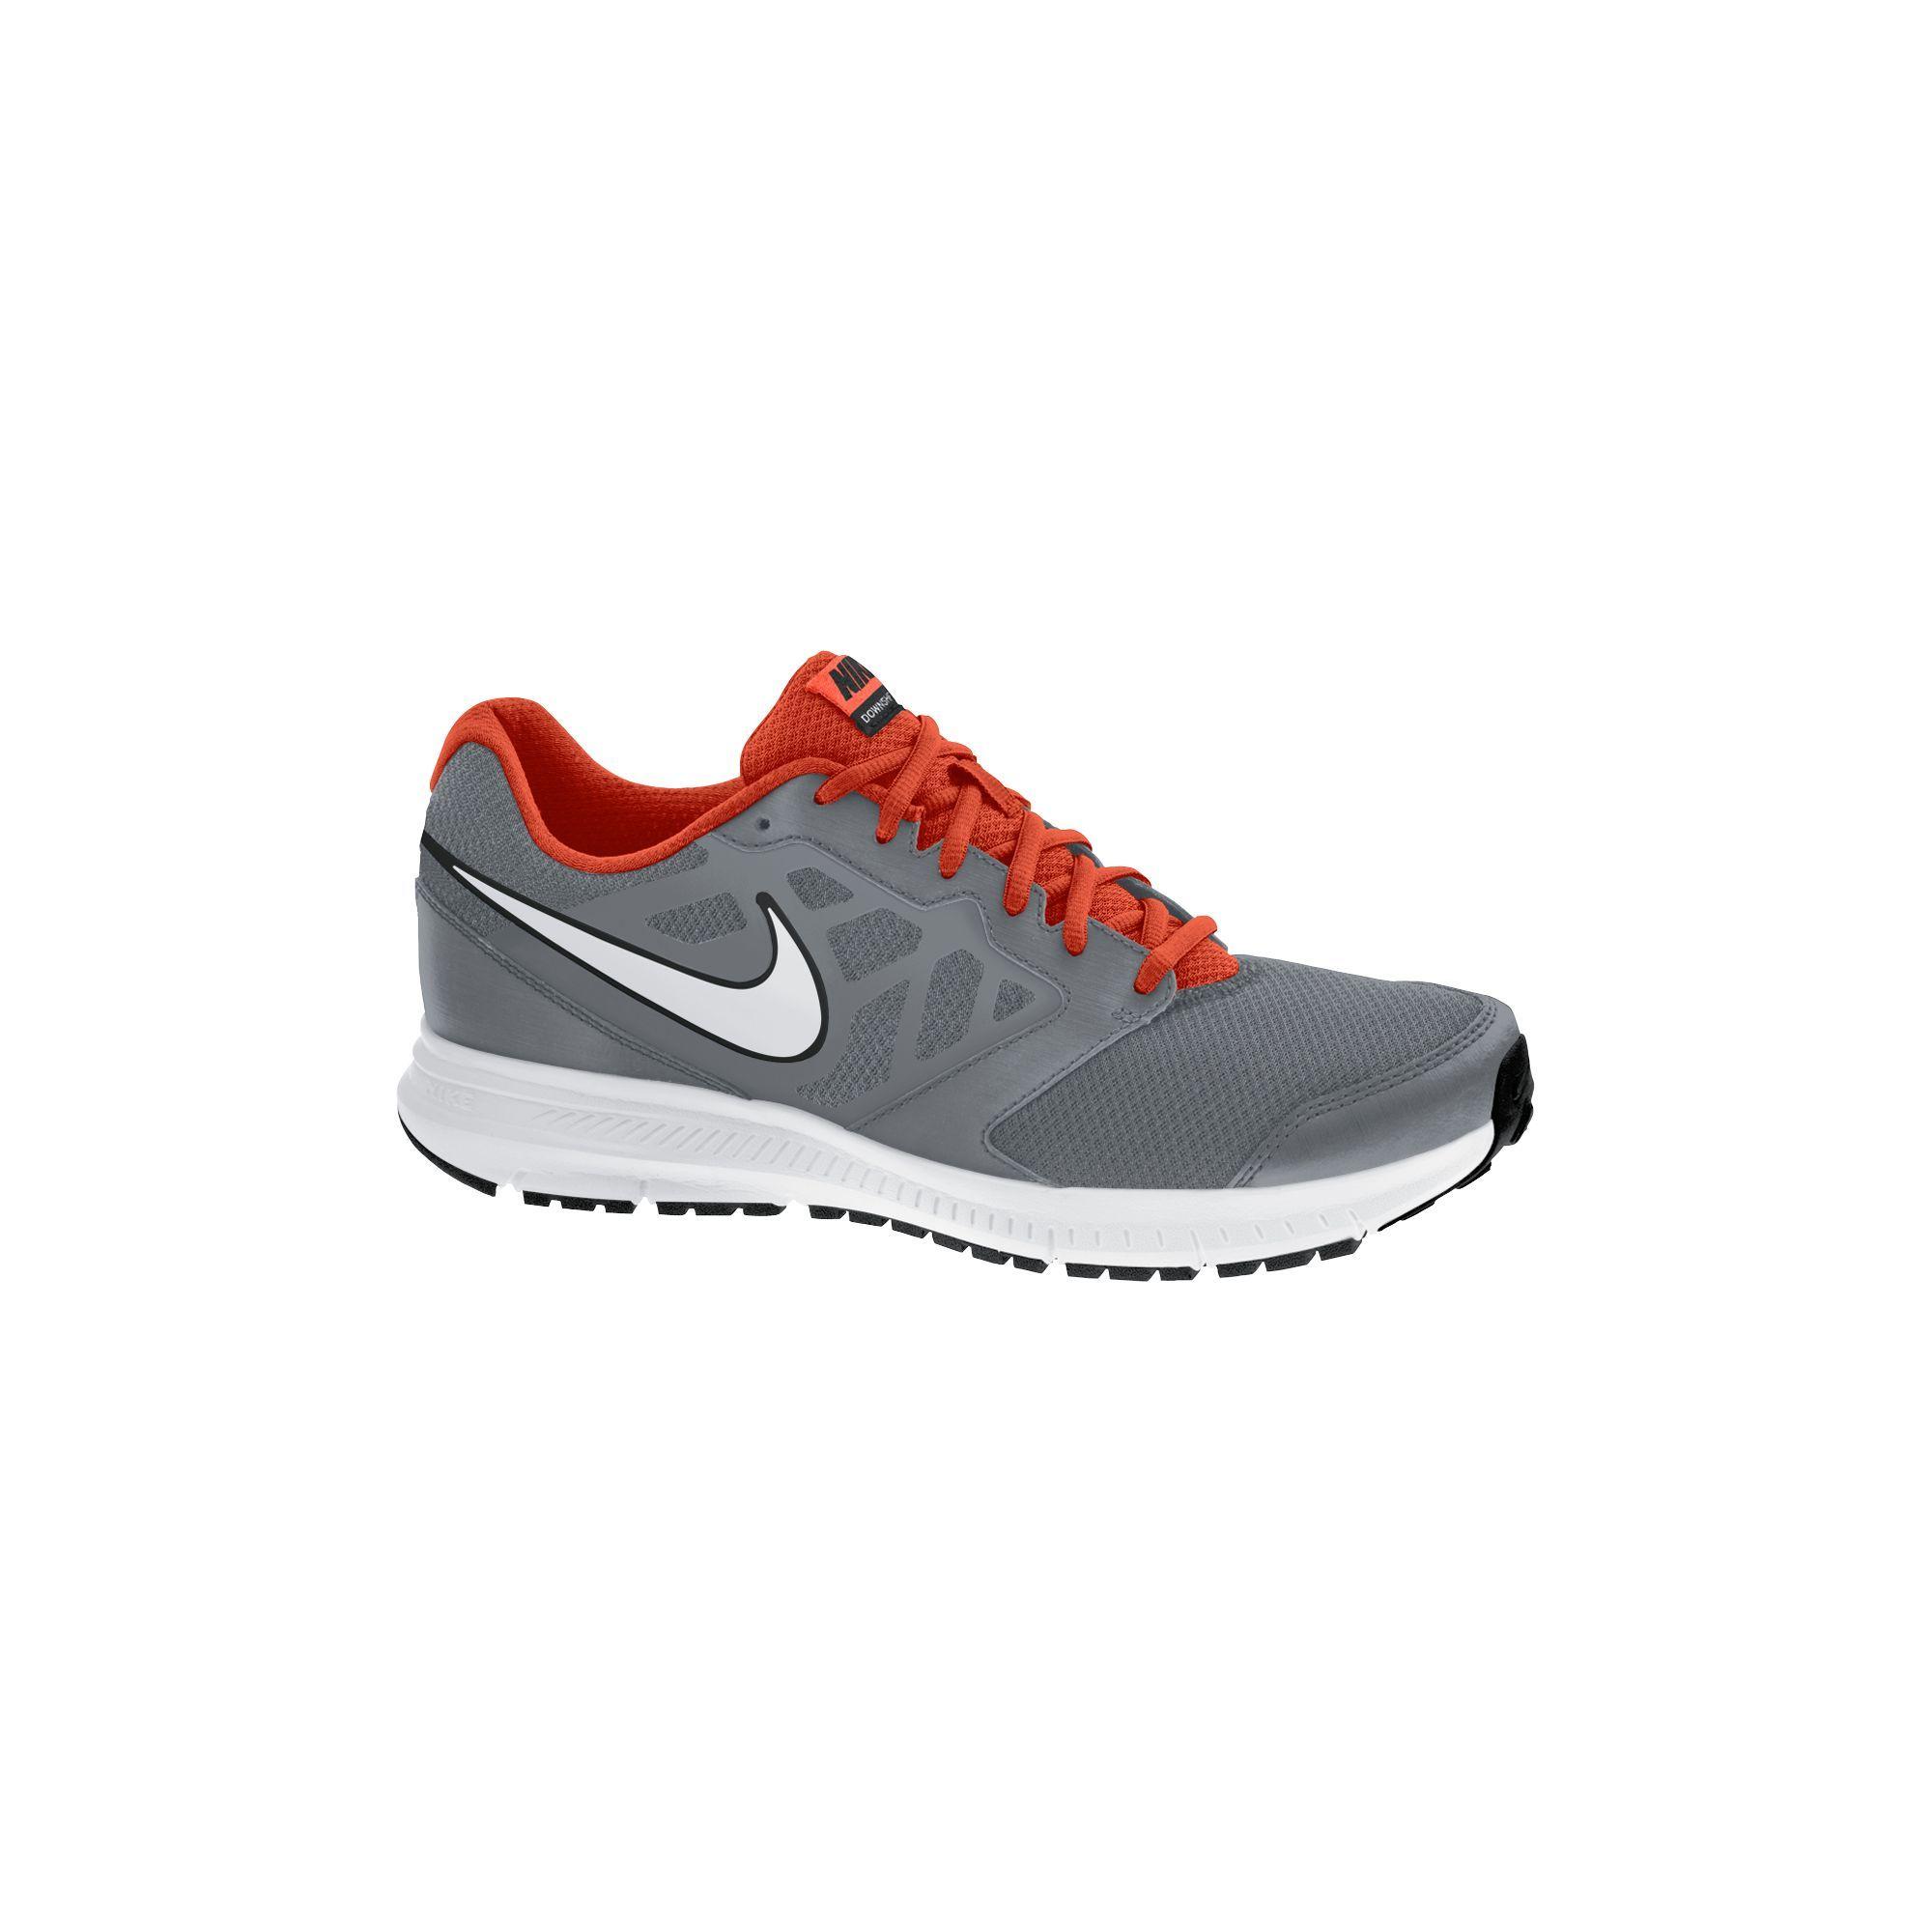 Big Nike Downshifter 6 Grey/Red Mens Running Shoe